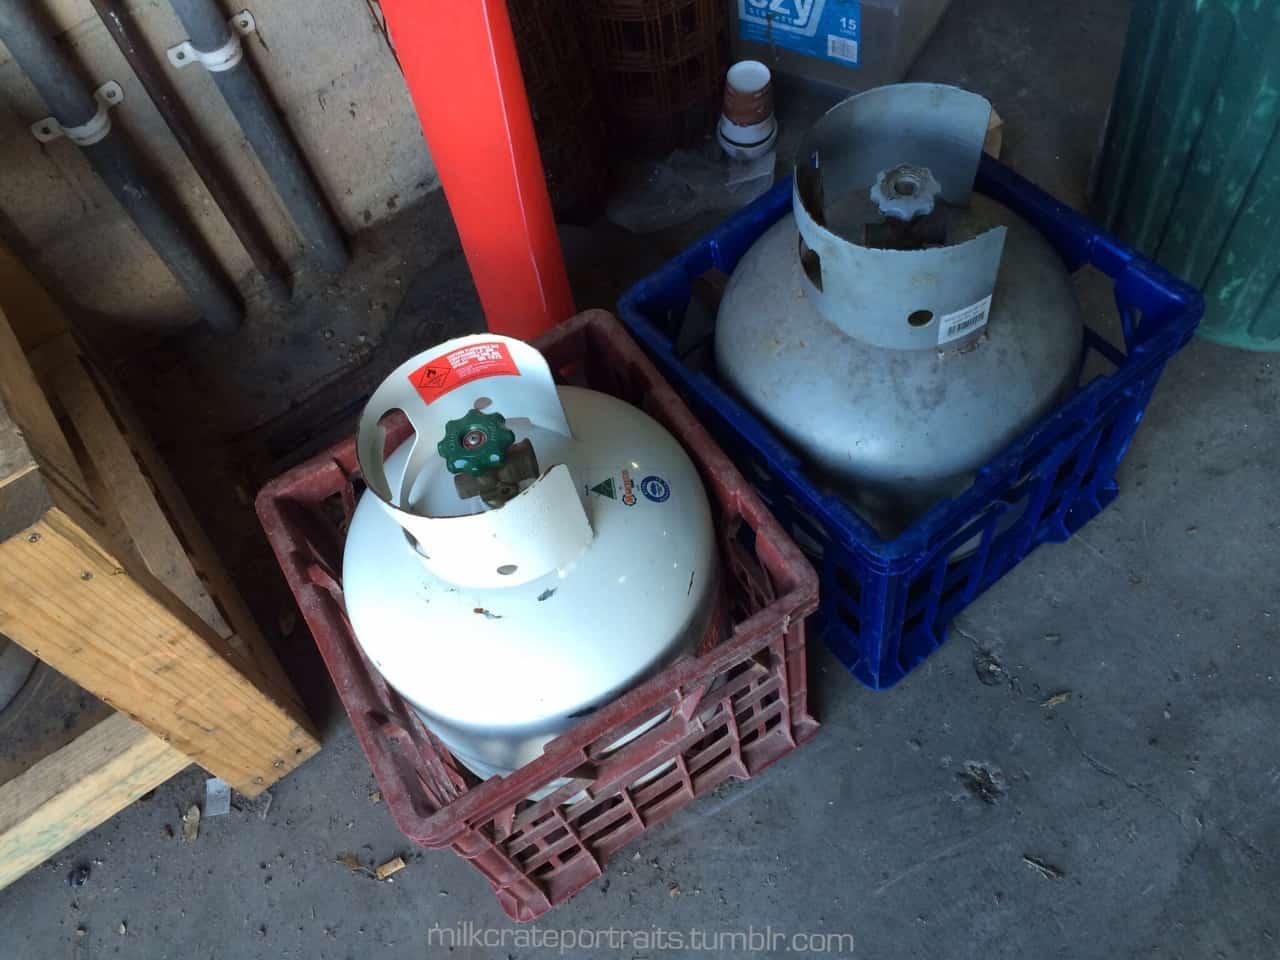 Gas bottles in milk crates